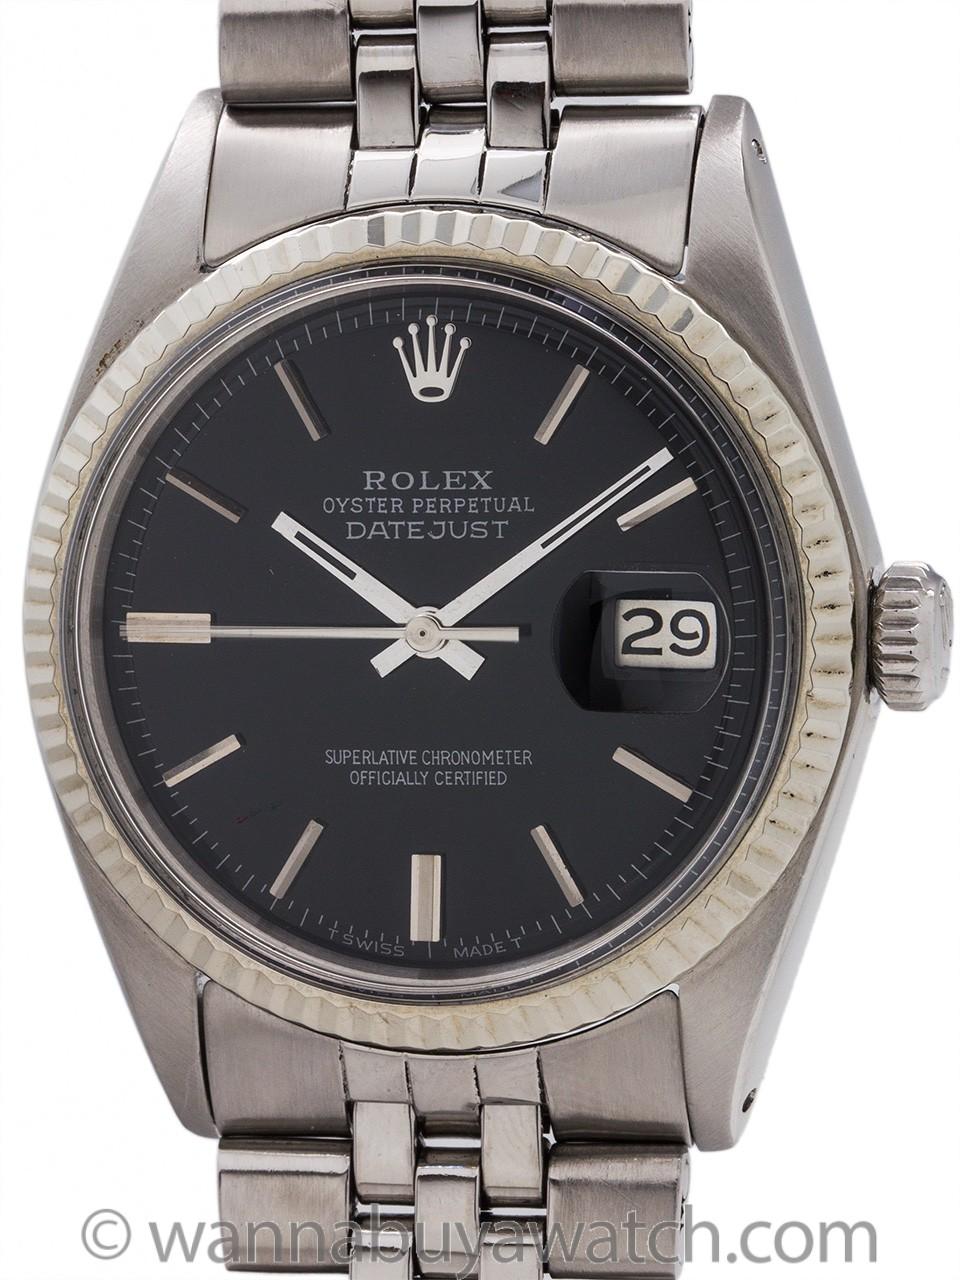 Rolex Datejust ref 1601 Black Pie Pan Dial circa 1970